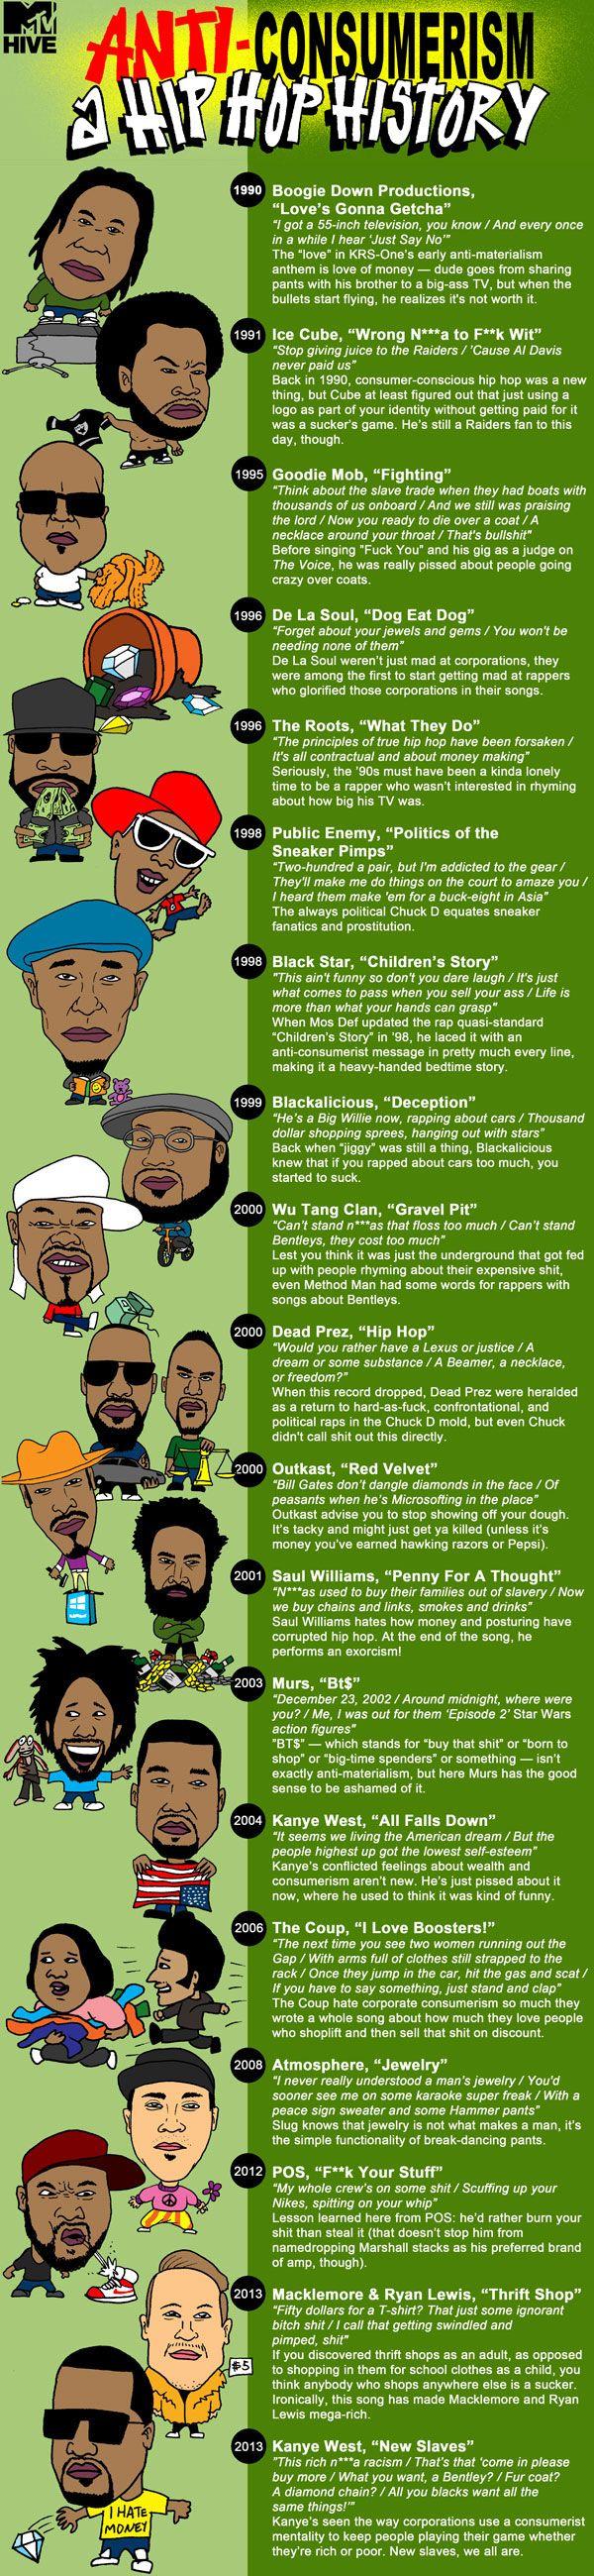 Anti-Consumerism: A Hip Hop History